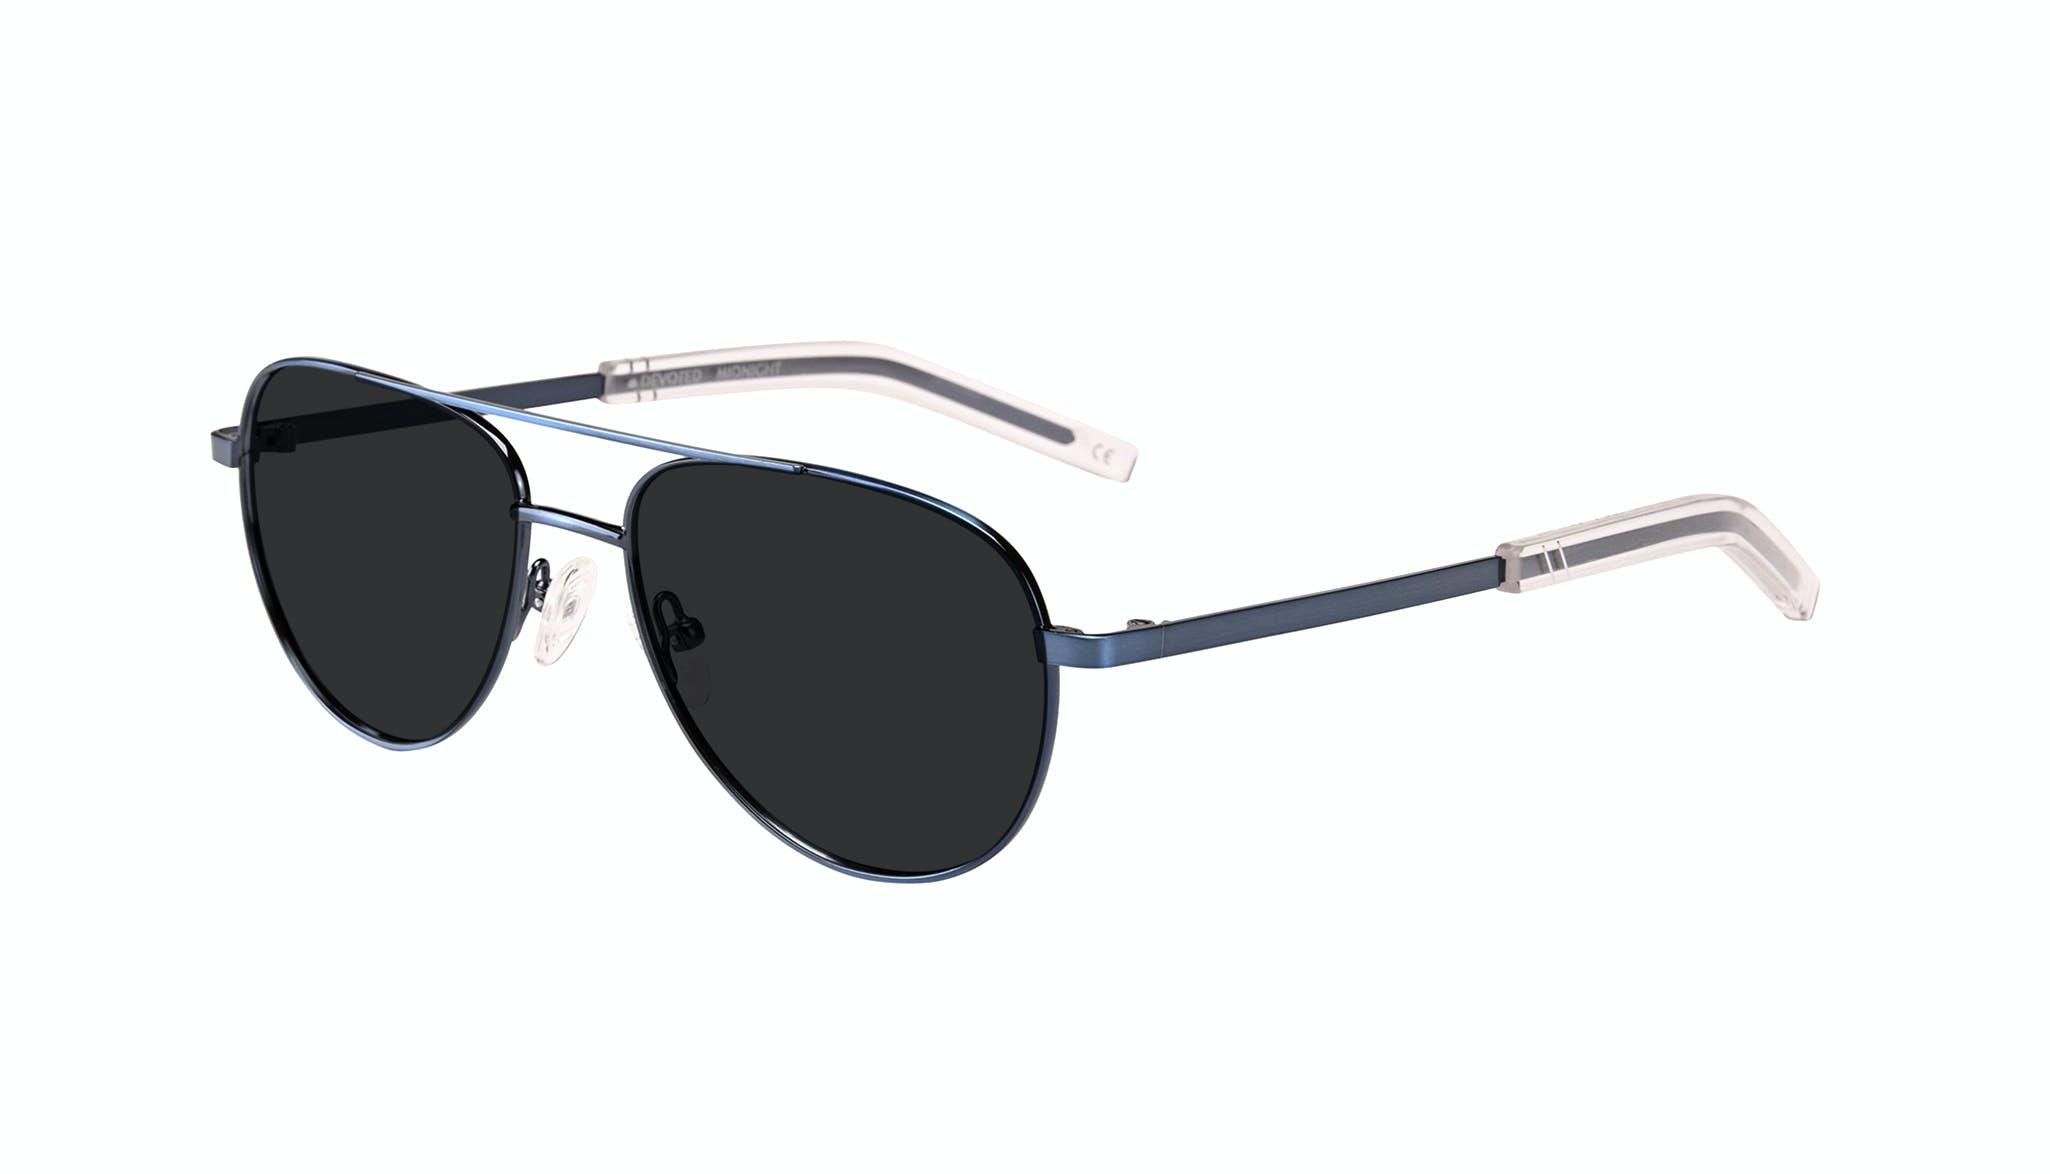 Affordable Fashion Glasses Aviator Sunglasses Men Devoted Midnight Tilt